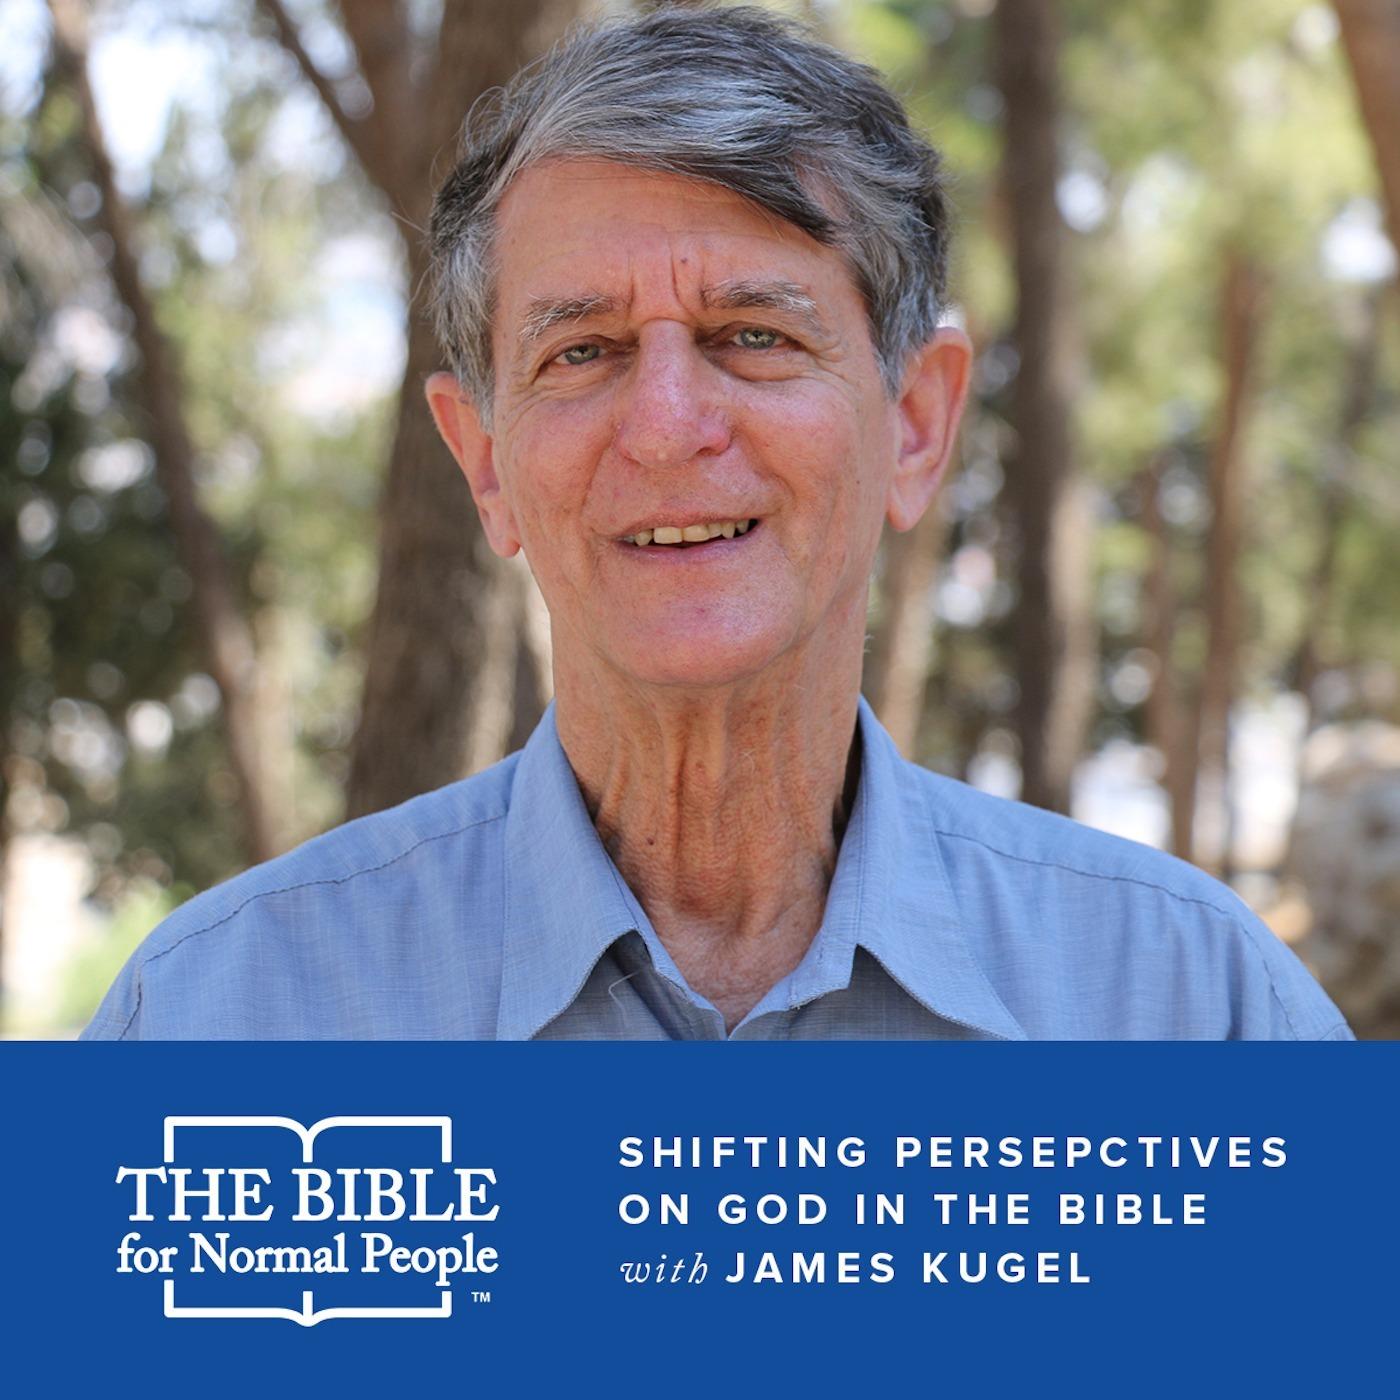 Episode 153: James Kugel - Shifting Perspectives on God in the Bible